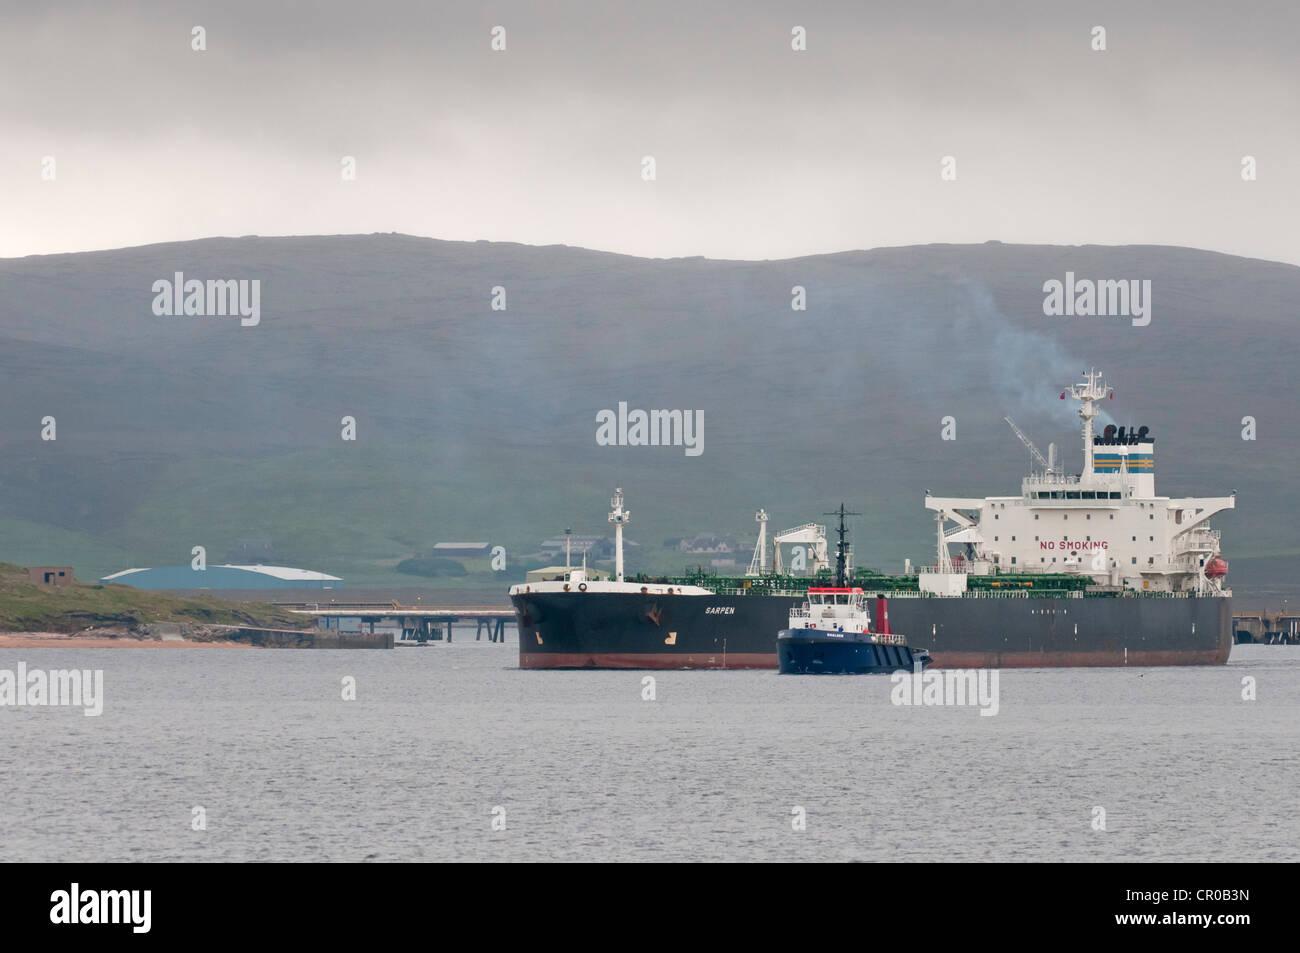 Oil tanker Sarpen and pilot boat Shalder negotiating Sullom Voe in the Shetland Islands. June 2010. - Stock Image